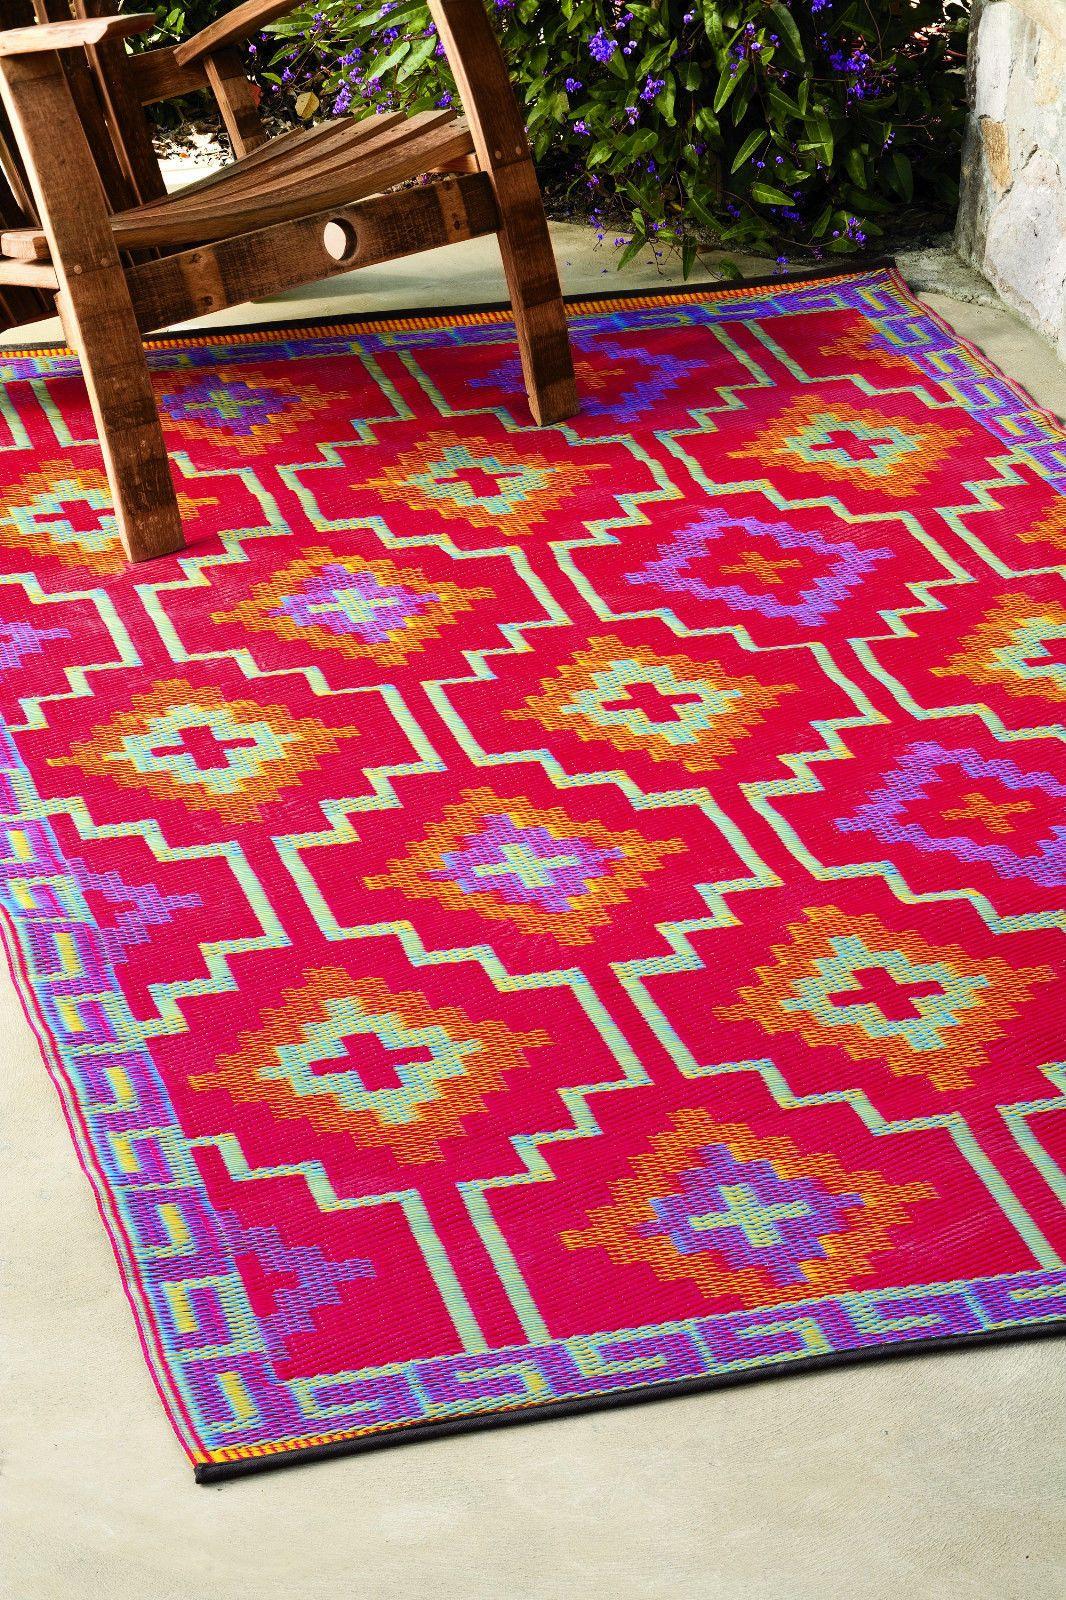 Great Details About Fab Habitat Indoor Outdoor Patio Rug Mat Lhasa Orange~Purple,  Choose Size